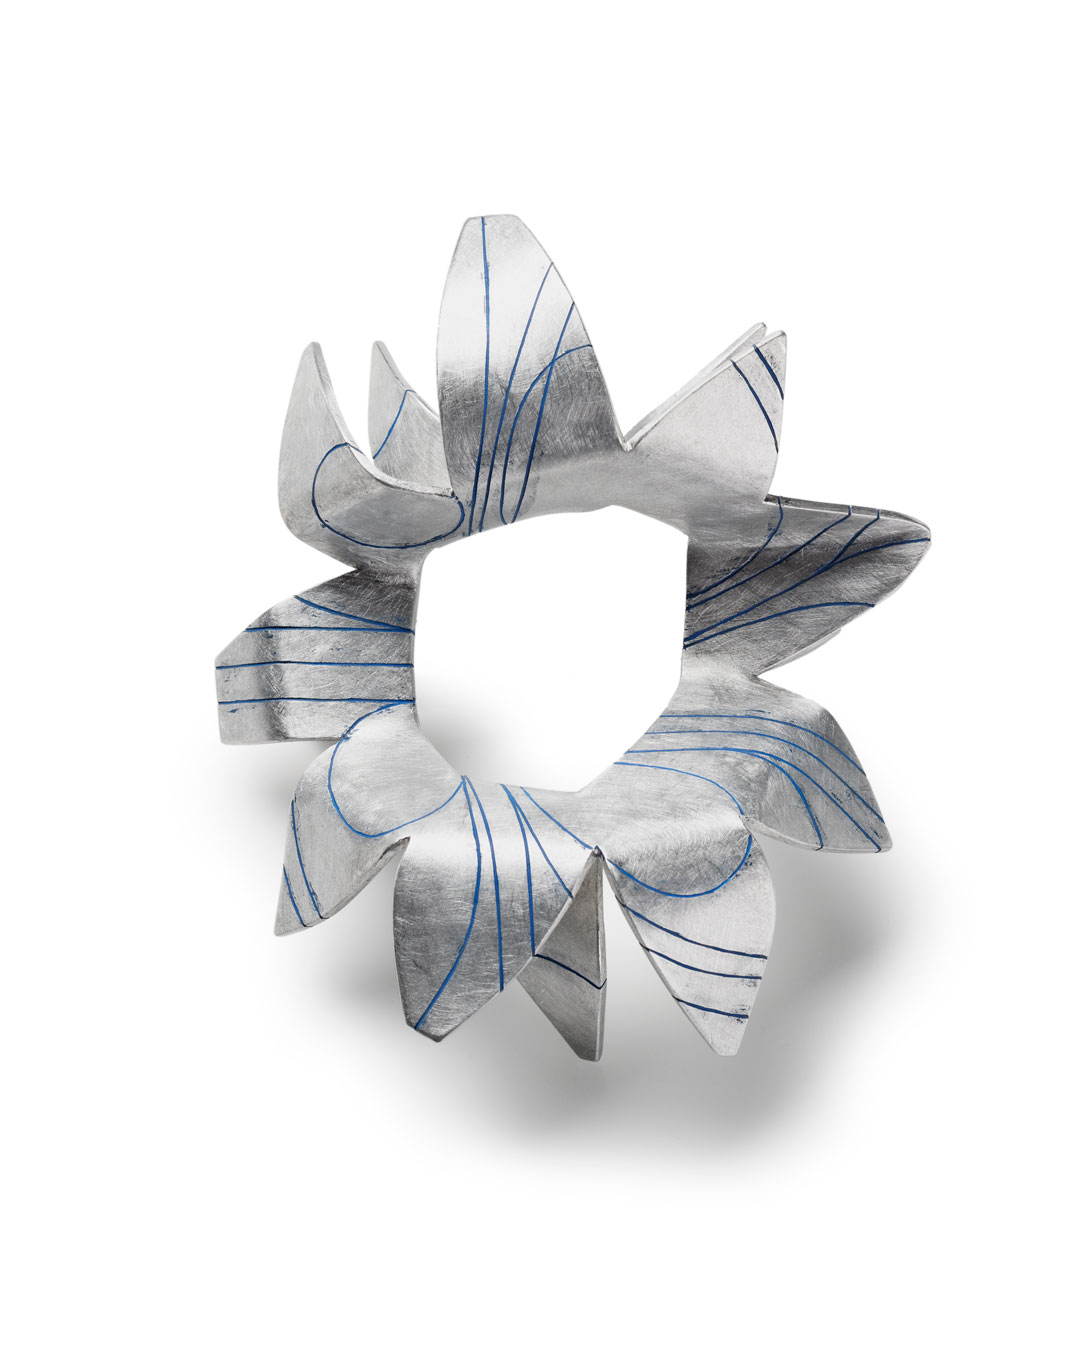 Ann Schmalwasser, Strahlen (Beams), 2013, brooch; aluminium, paint, 110 x 130 x 70 mm, €730